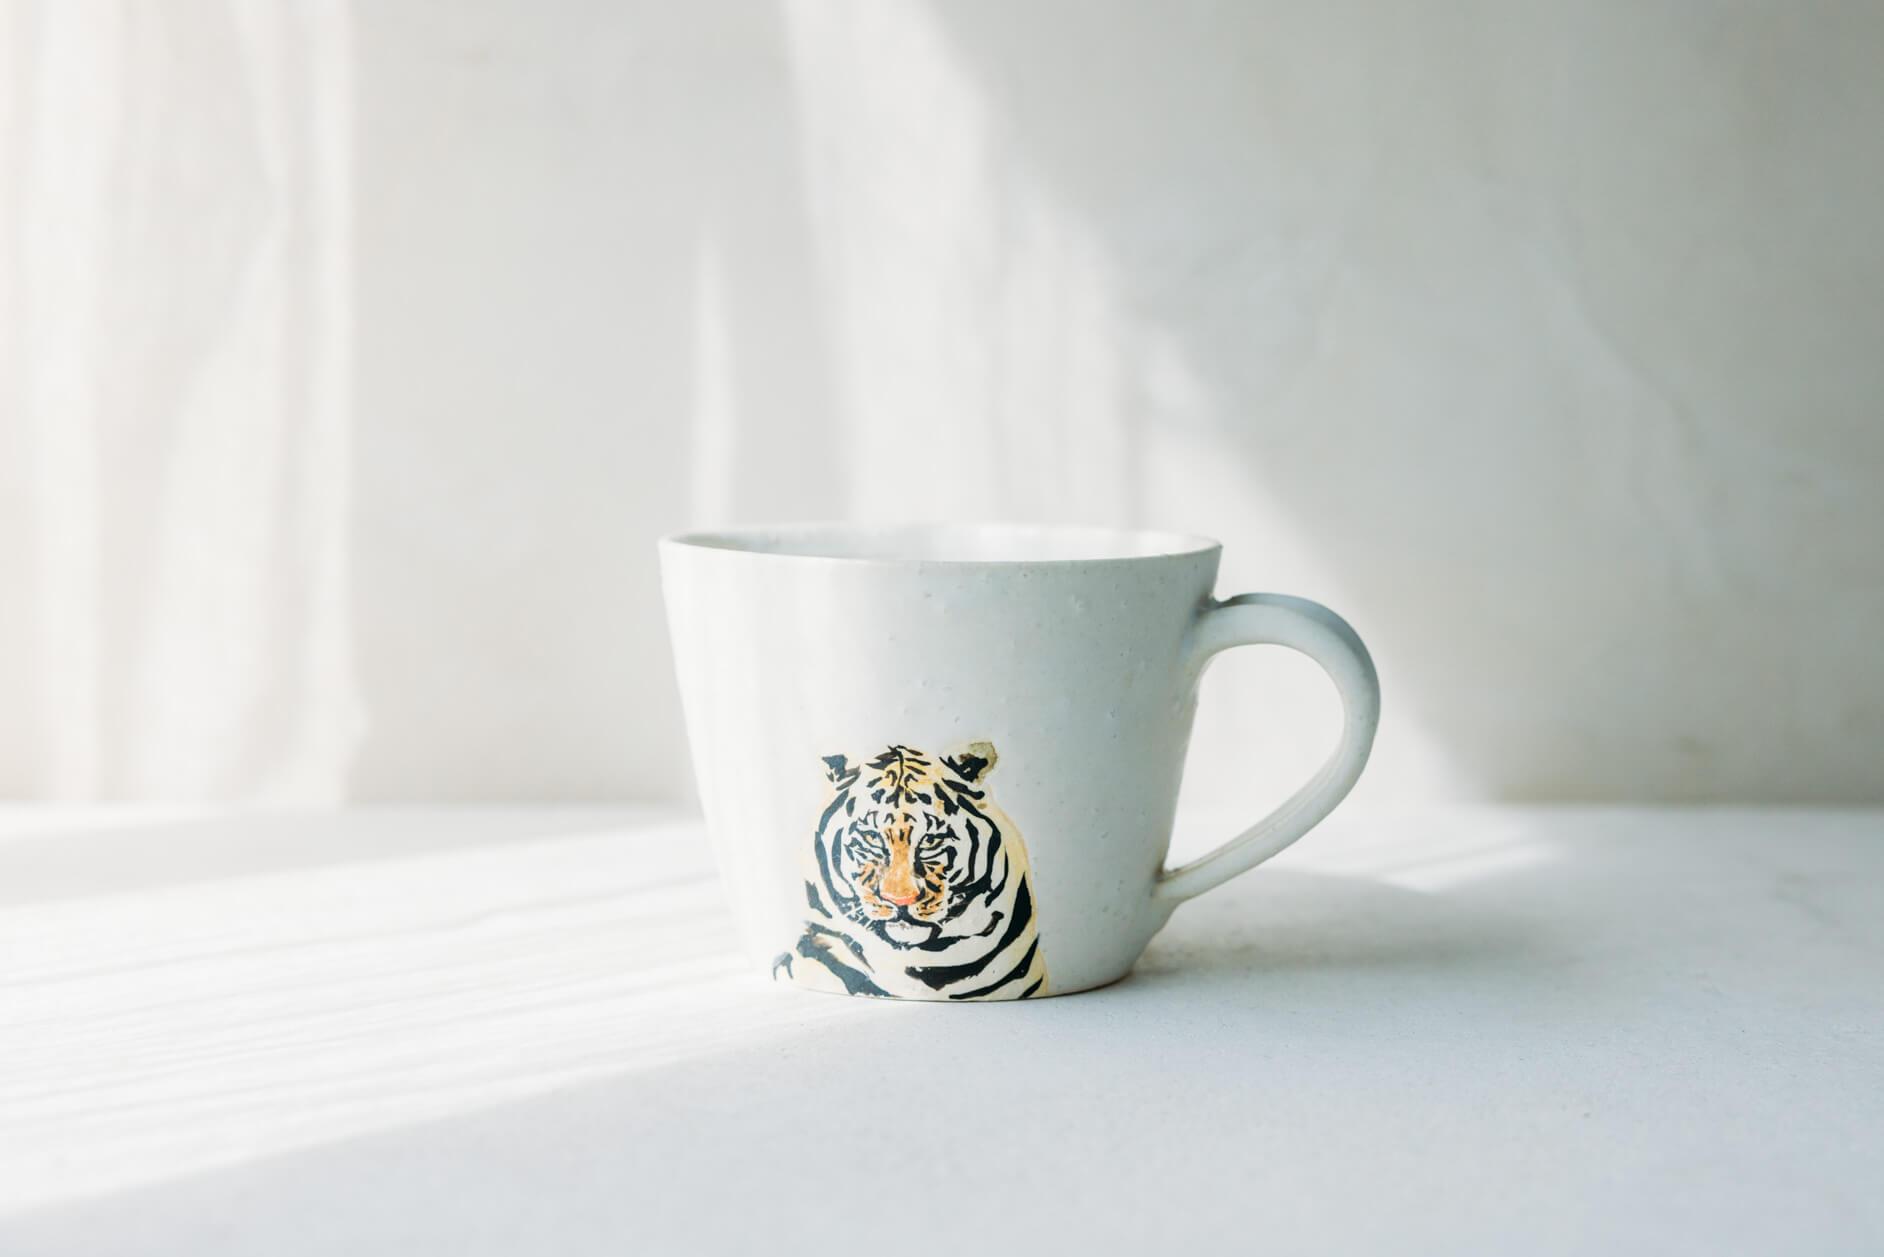 Acne pottery studio 森安幸代 作品 通販